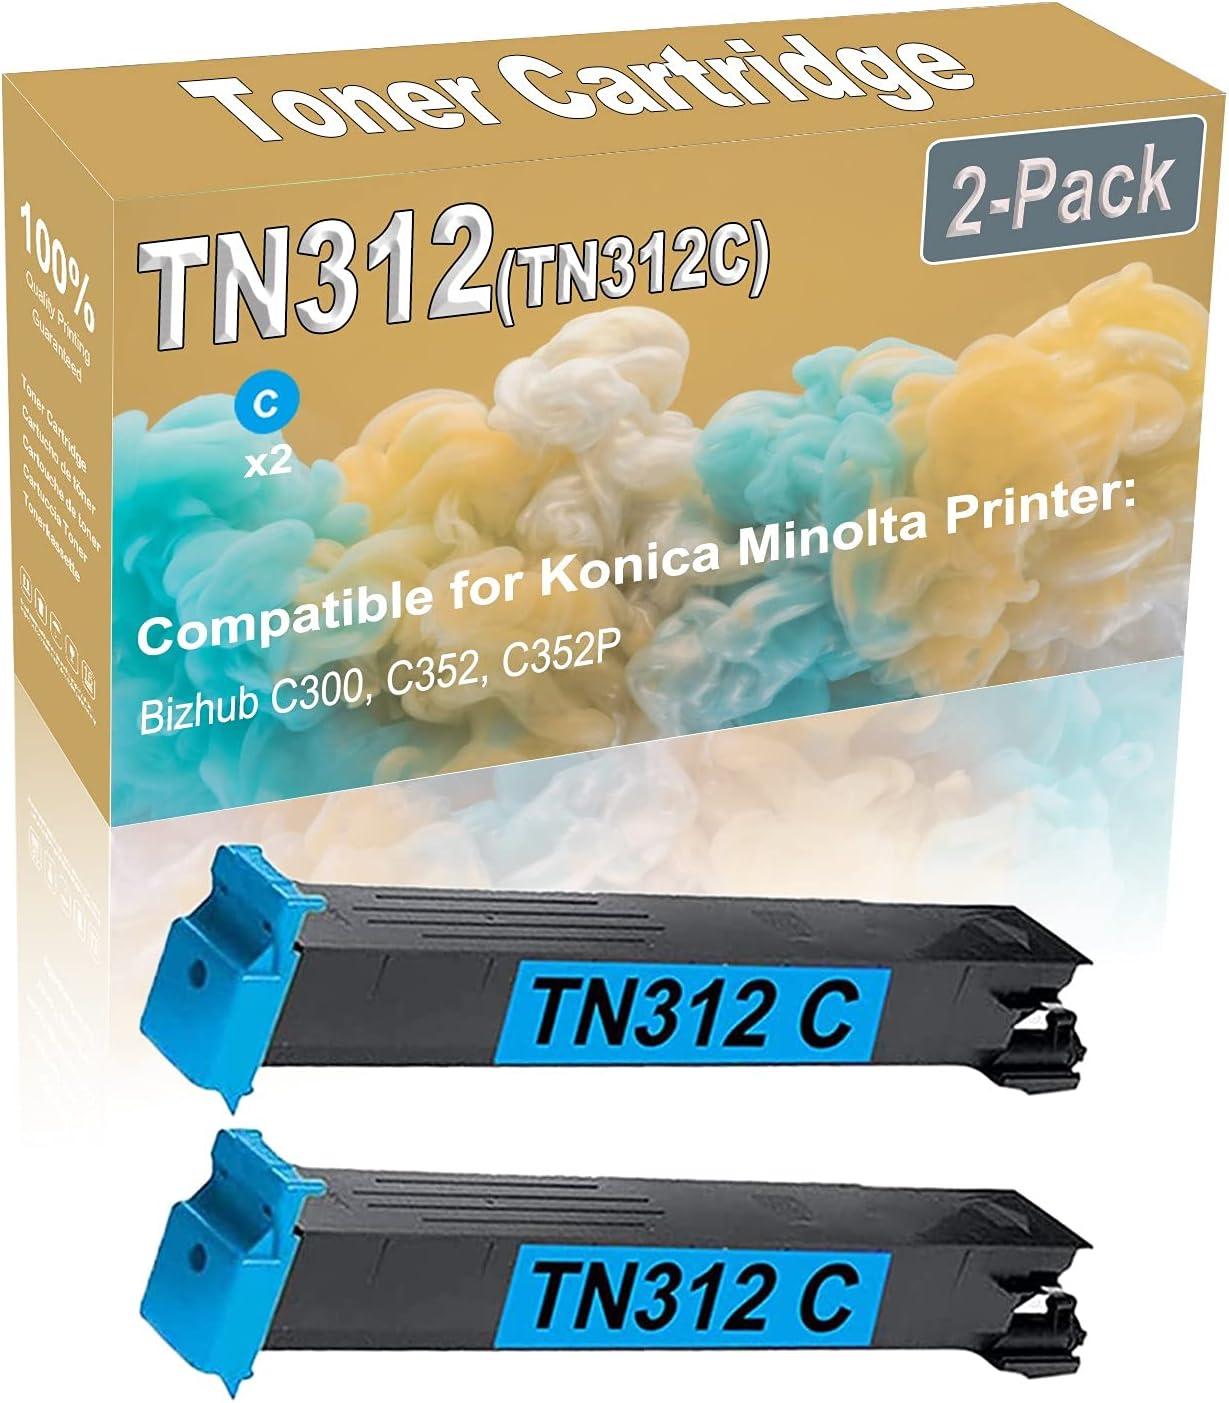 2-Pack (Cyan) Compatible High Yield TN312 (TN312C) Printer Toner Cartridge use for Konica Minolta Bizhub C300 C352 C352P Printers